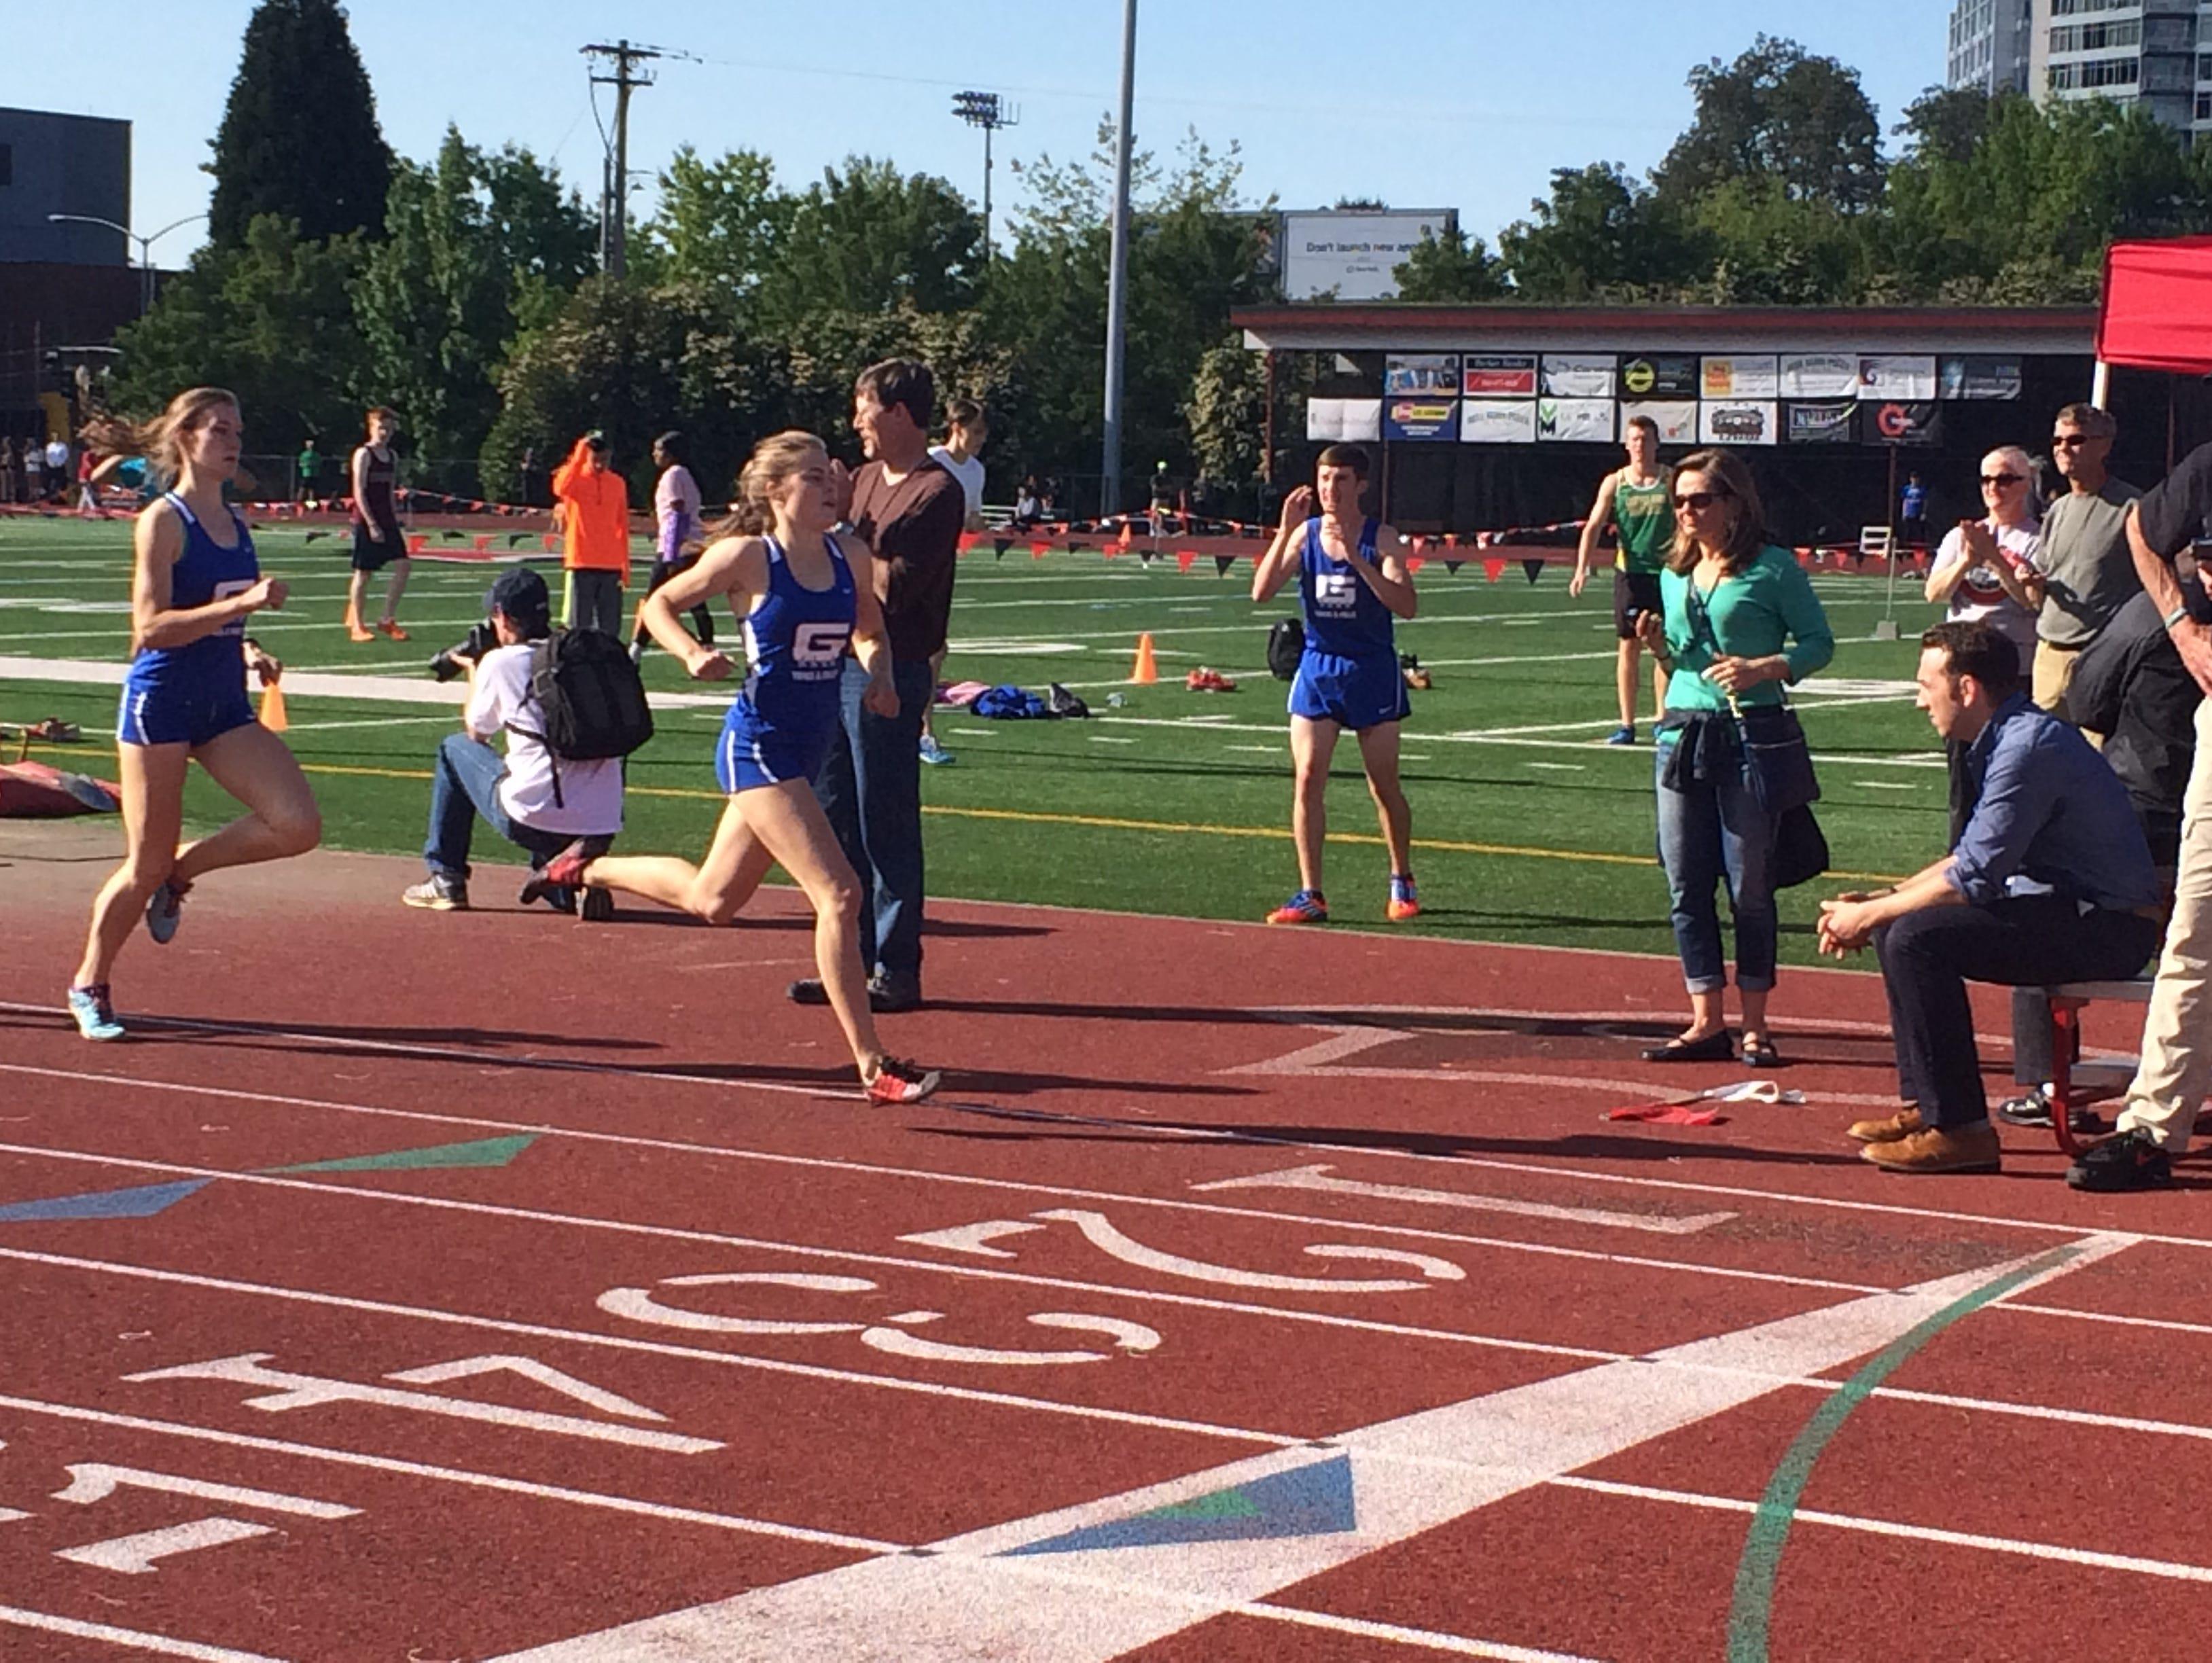 Ella Donaghu leads in the 800 meter race.